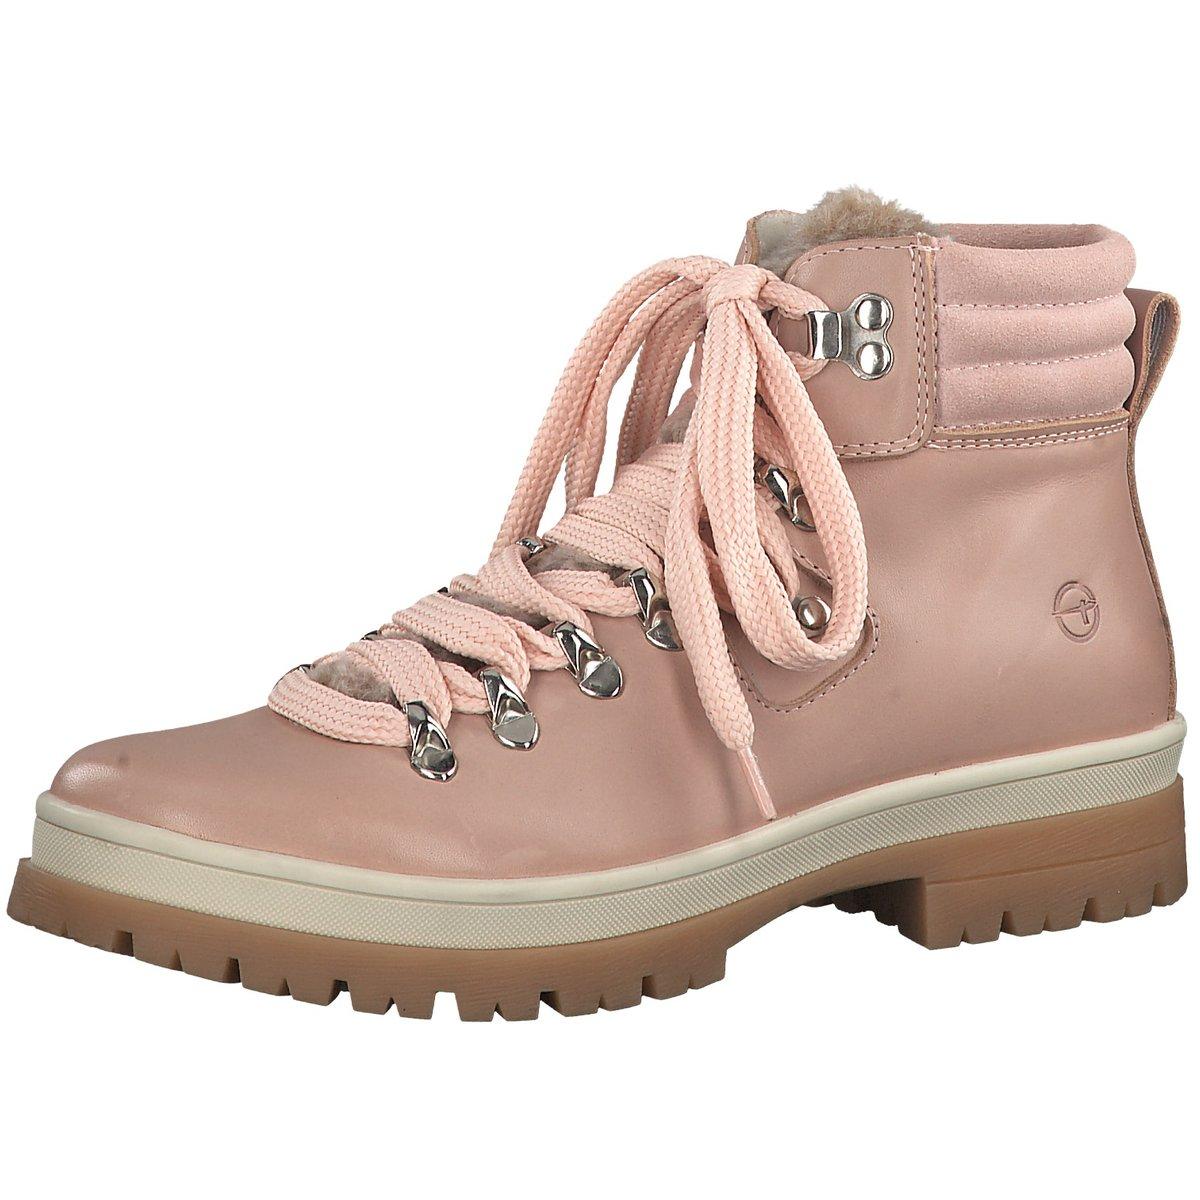 TAMARIS Damen Schuhe Stiefeletten Women Sneaker  Echtleder Sneakers 25779 NEU